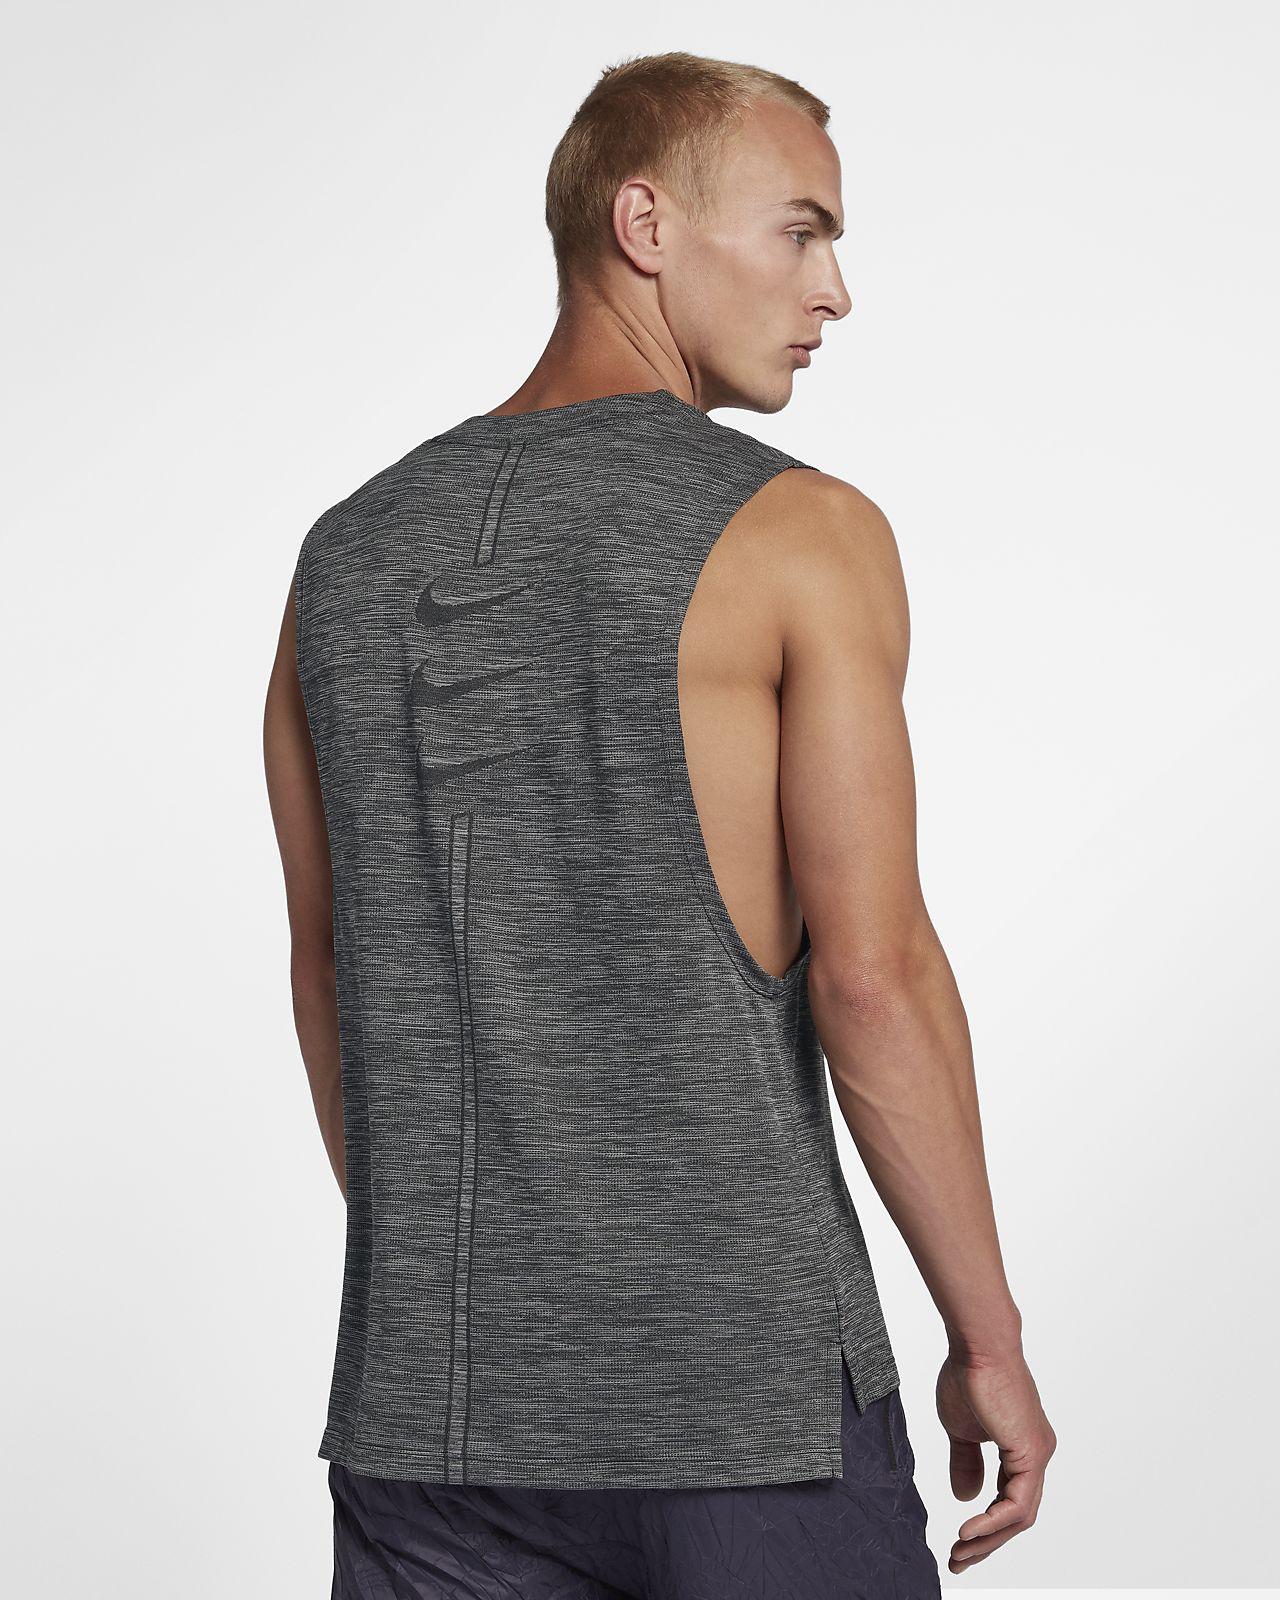 6ace46e282700 Nike Medalist Run Division Camiseta de running sin mangas - Hombre ...